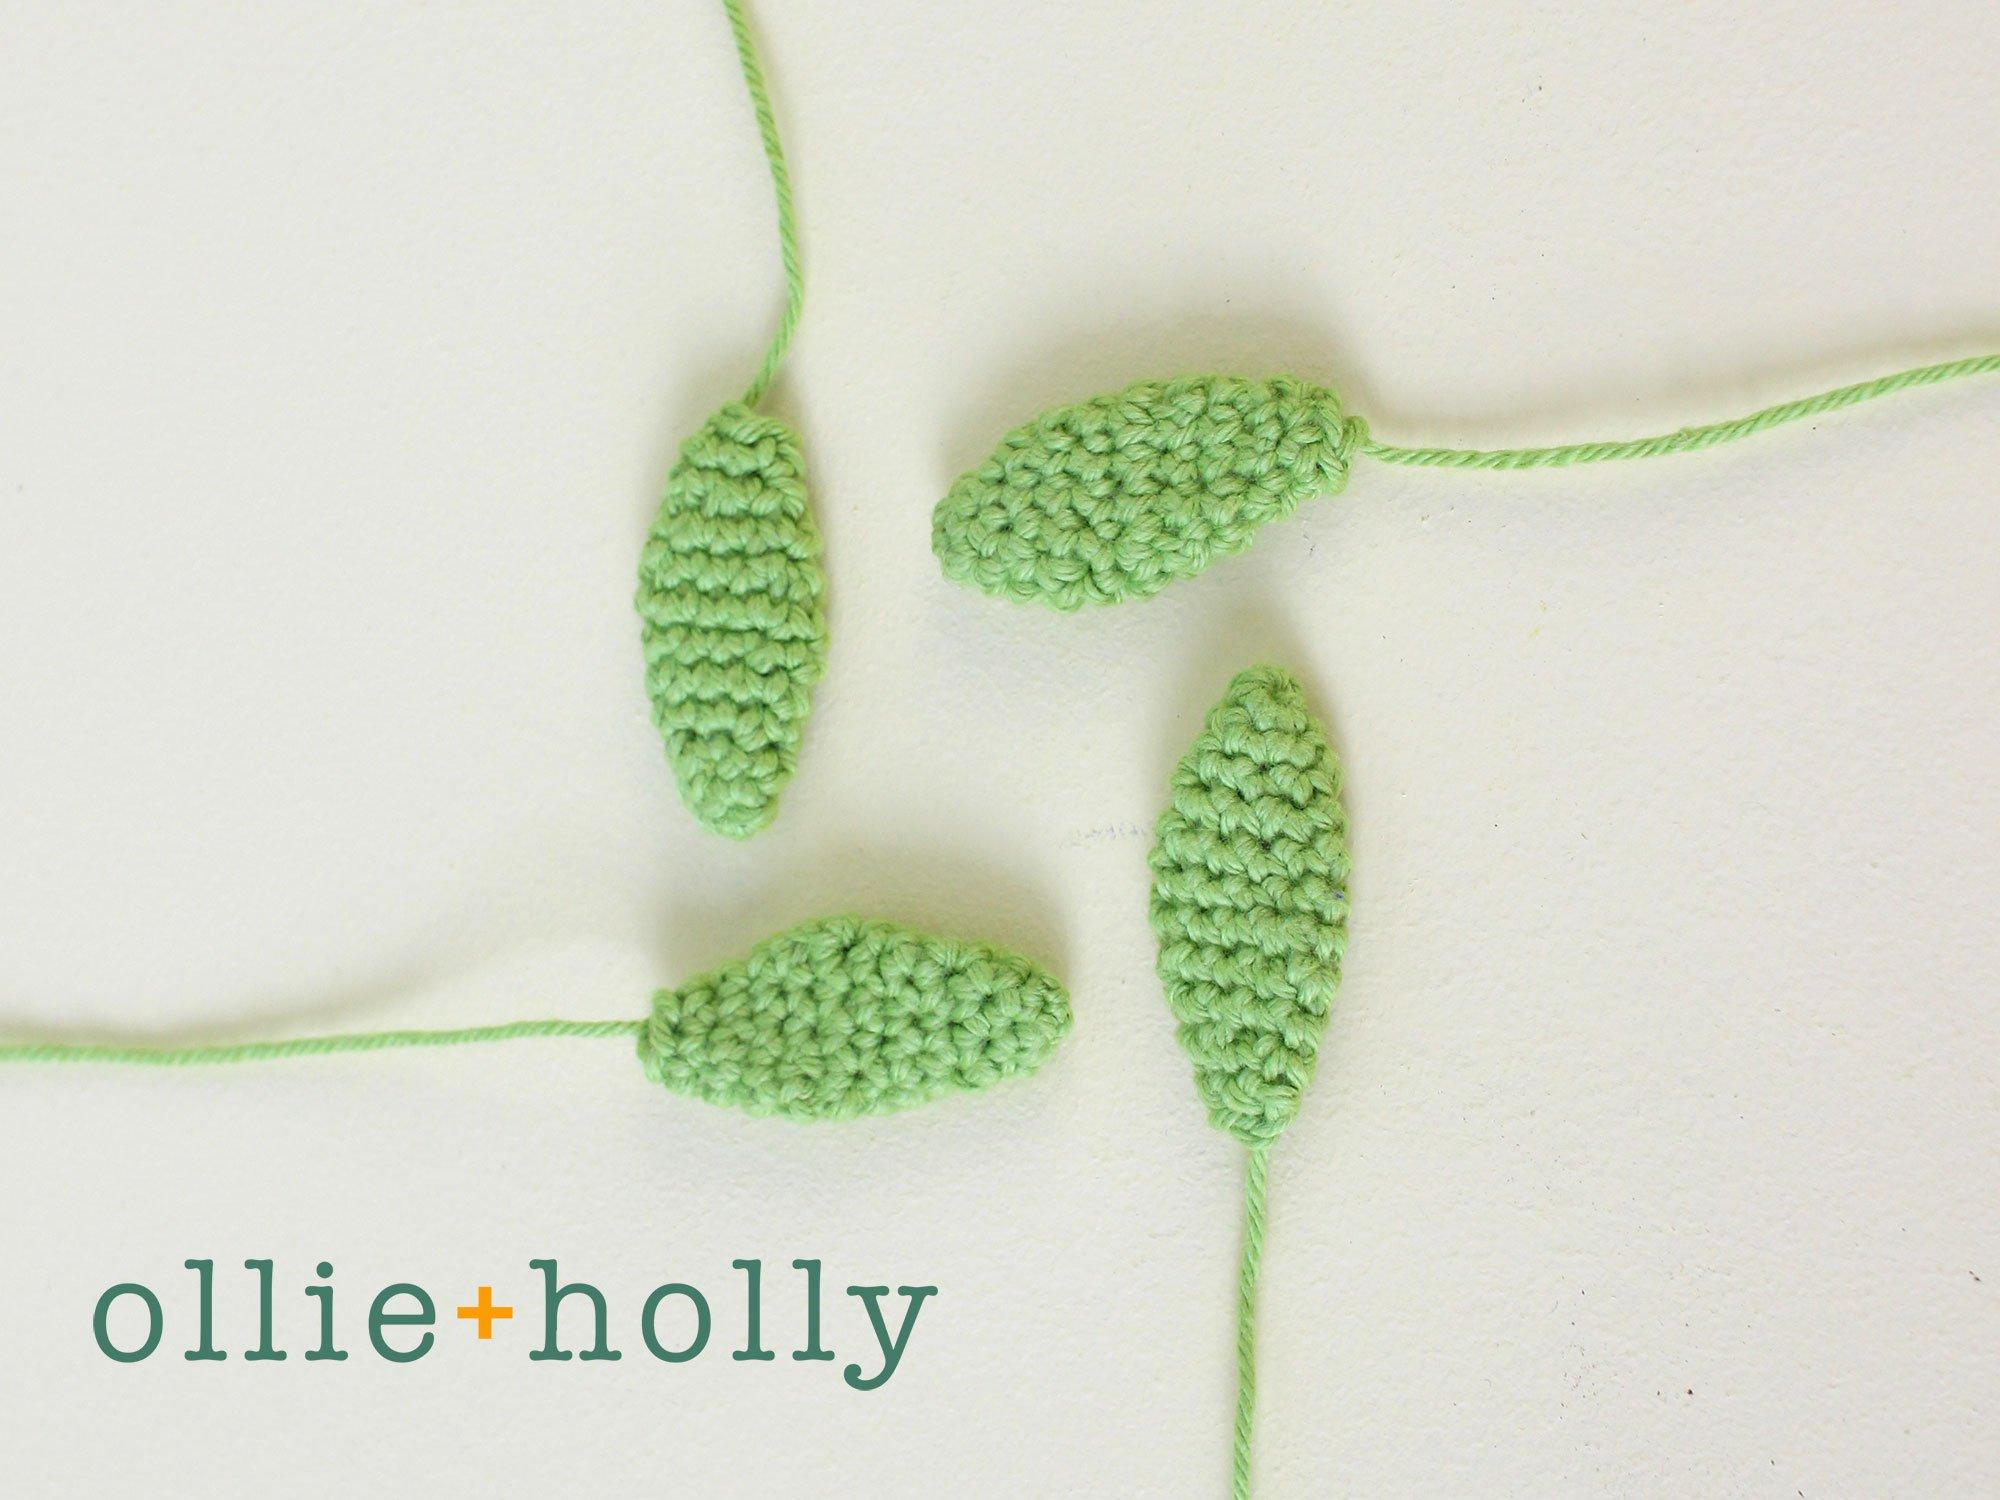 Free Sedum Adolphii Succulents (Golden Glow) Amigurumi Crochet Pattern Step 3